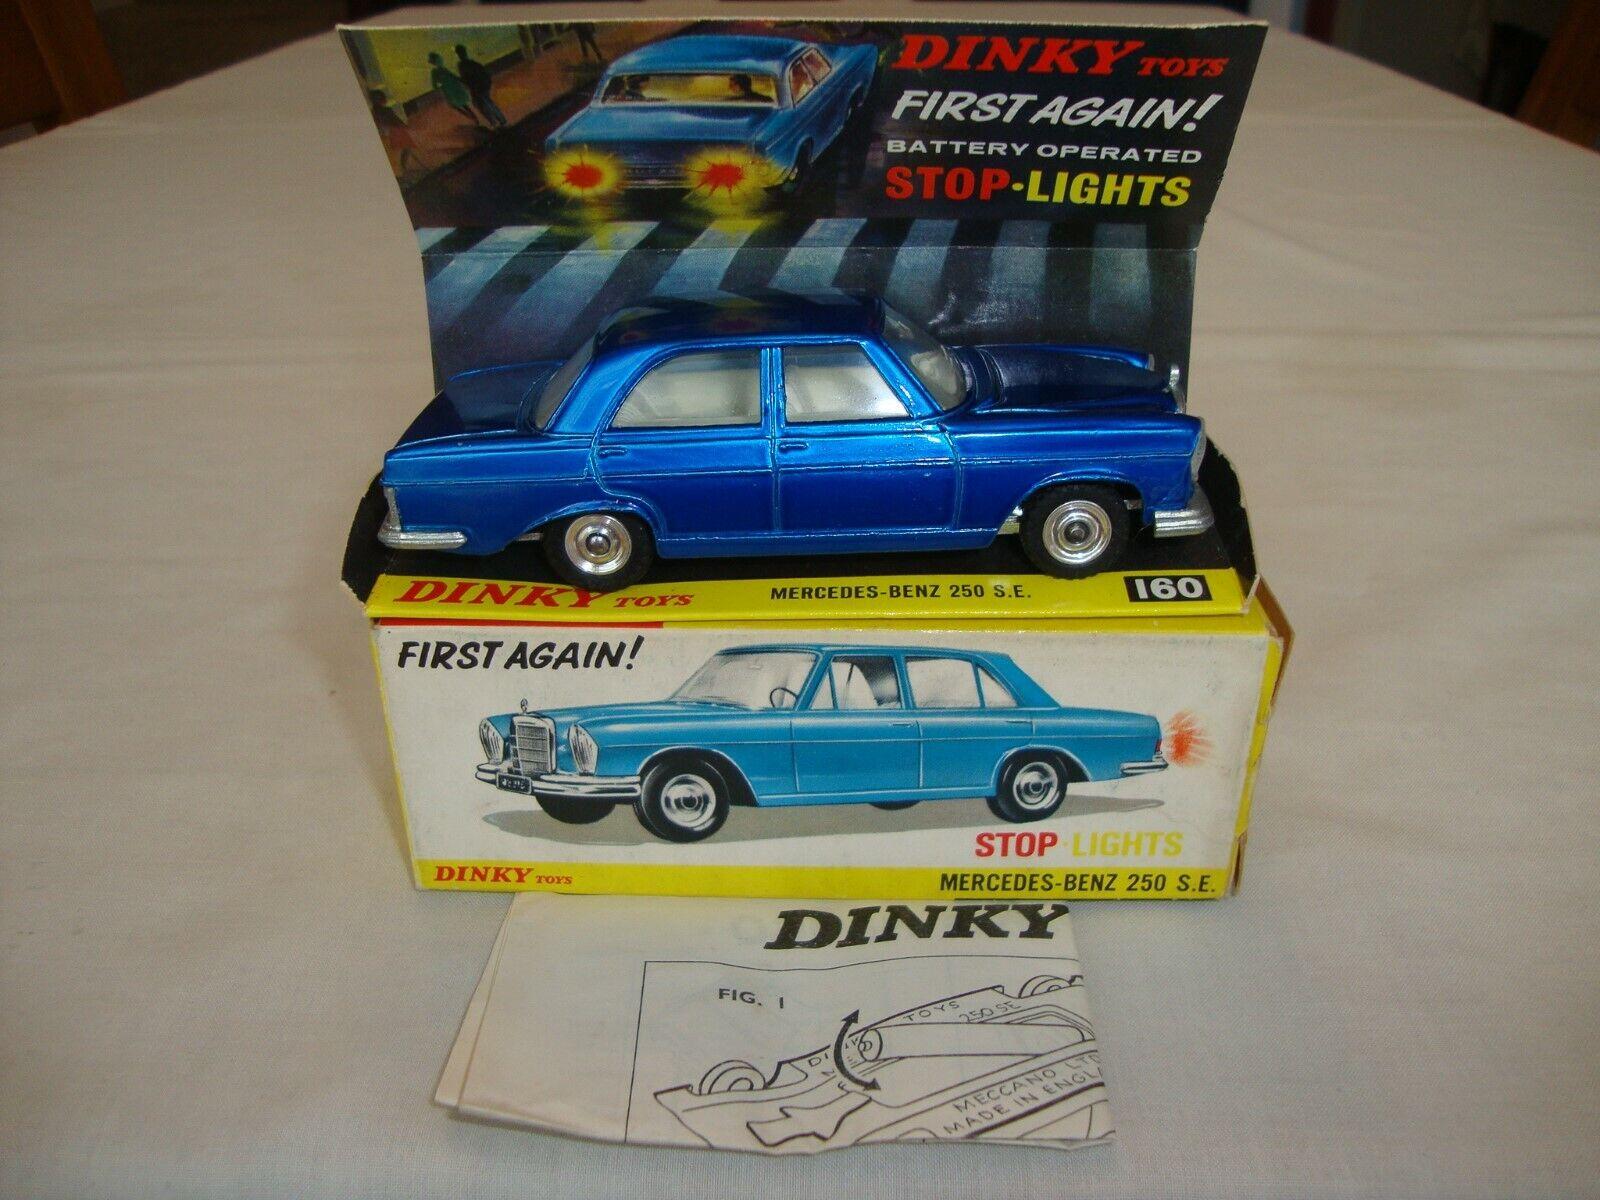 Dinky 160  MERCEDES-BENZ 250 SE-Excellent dans boîte d'origine  magasin d'offre